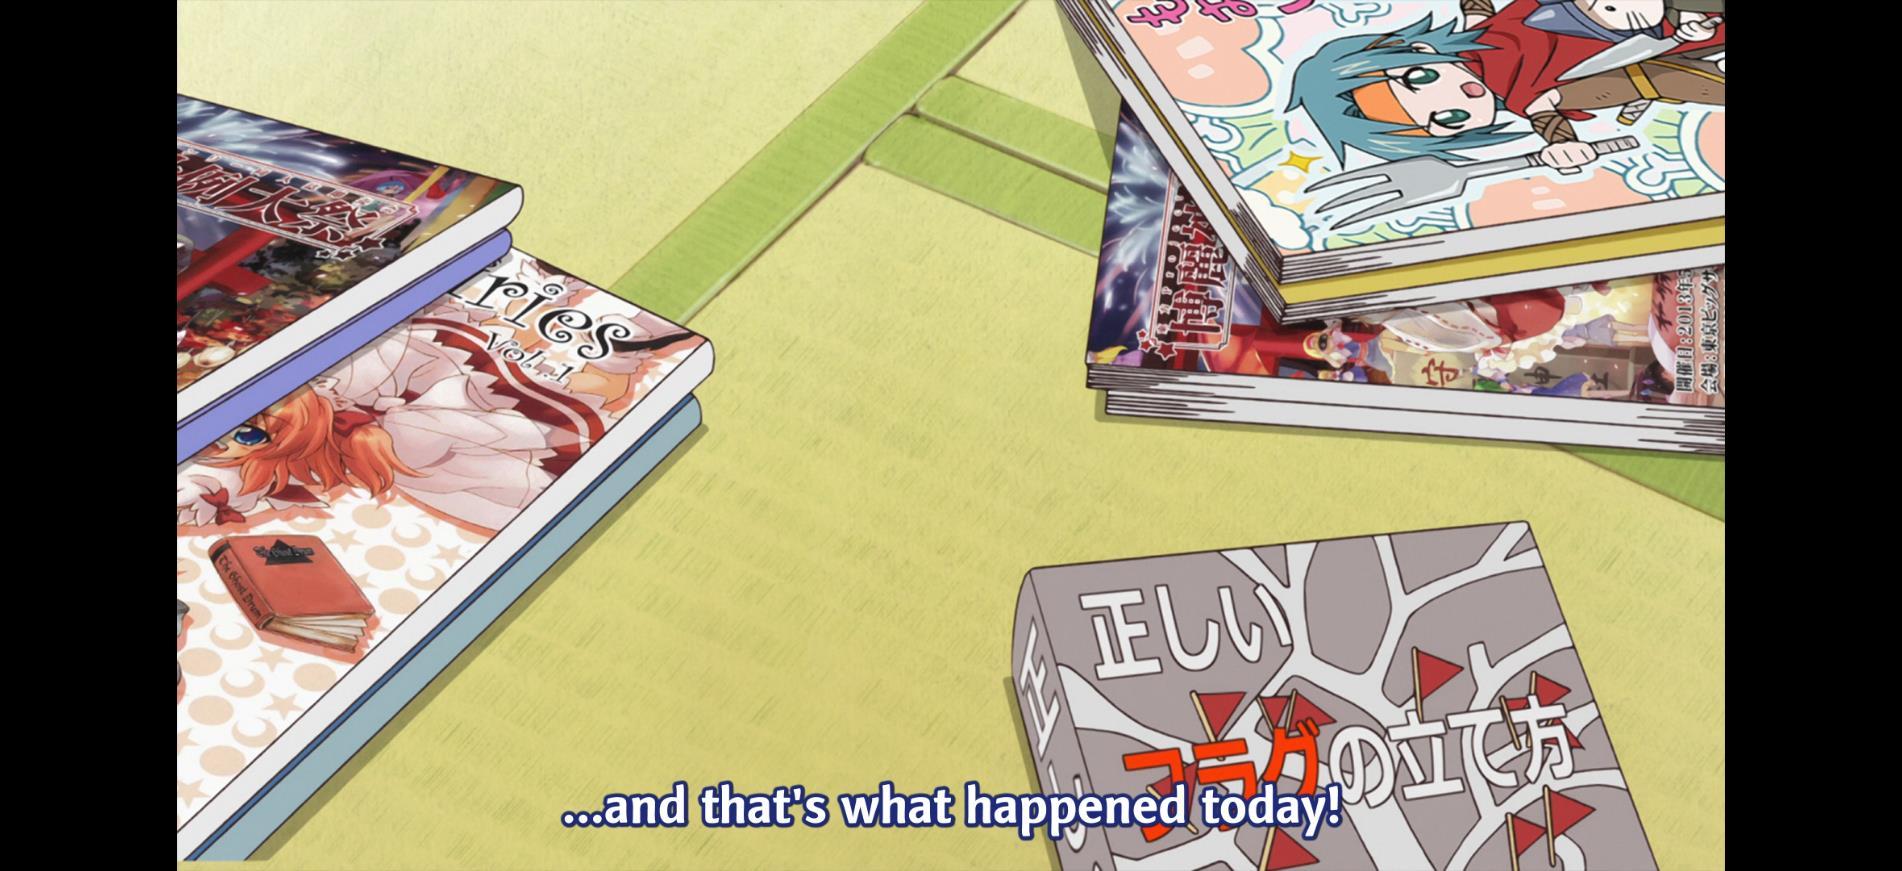 [2.0] Caméos et clins d'oeil dans les anime et mangas!  - Page 9 245358MiyakawakenoKuufukuBD1080pFLAC85E2C746mkvsnapshot325120160928124224